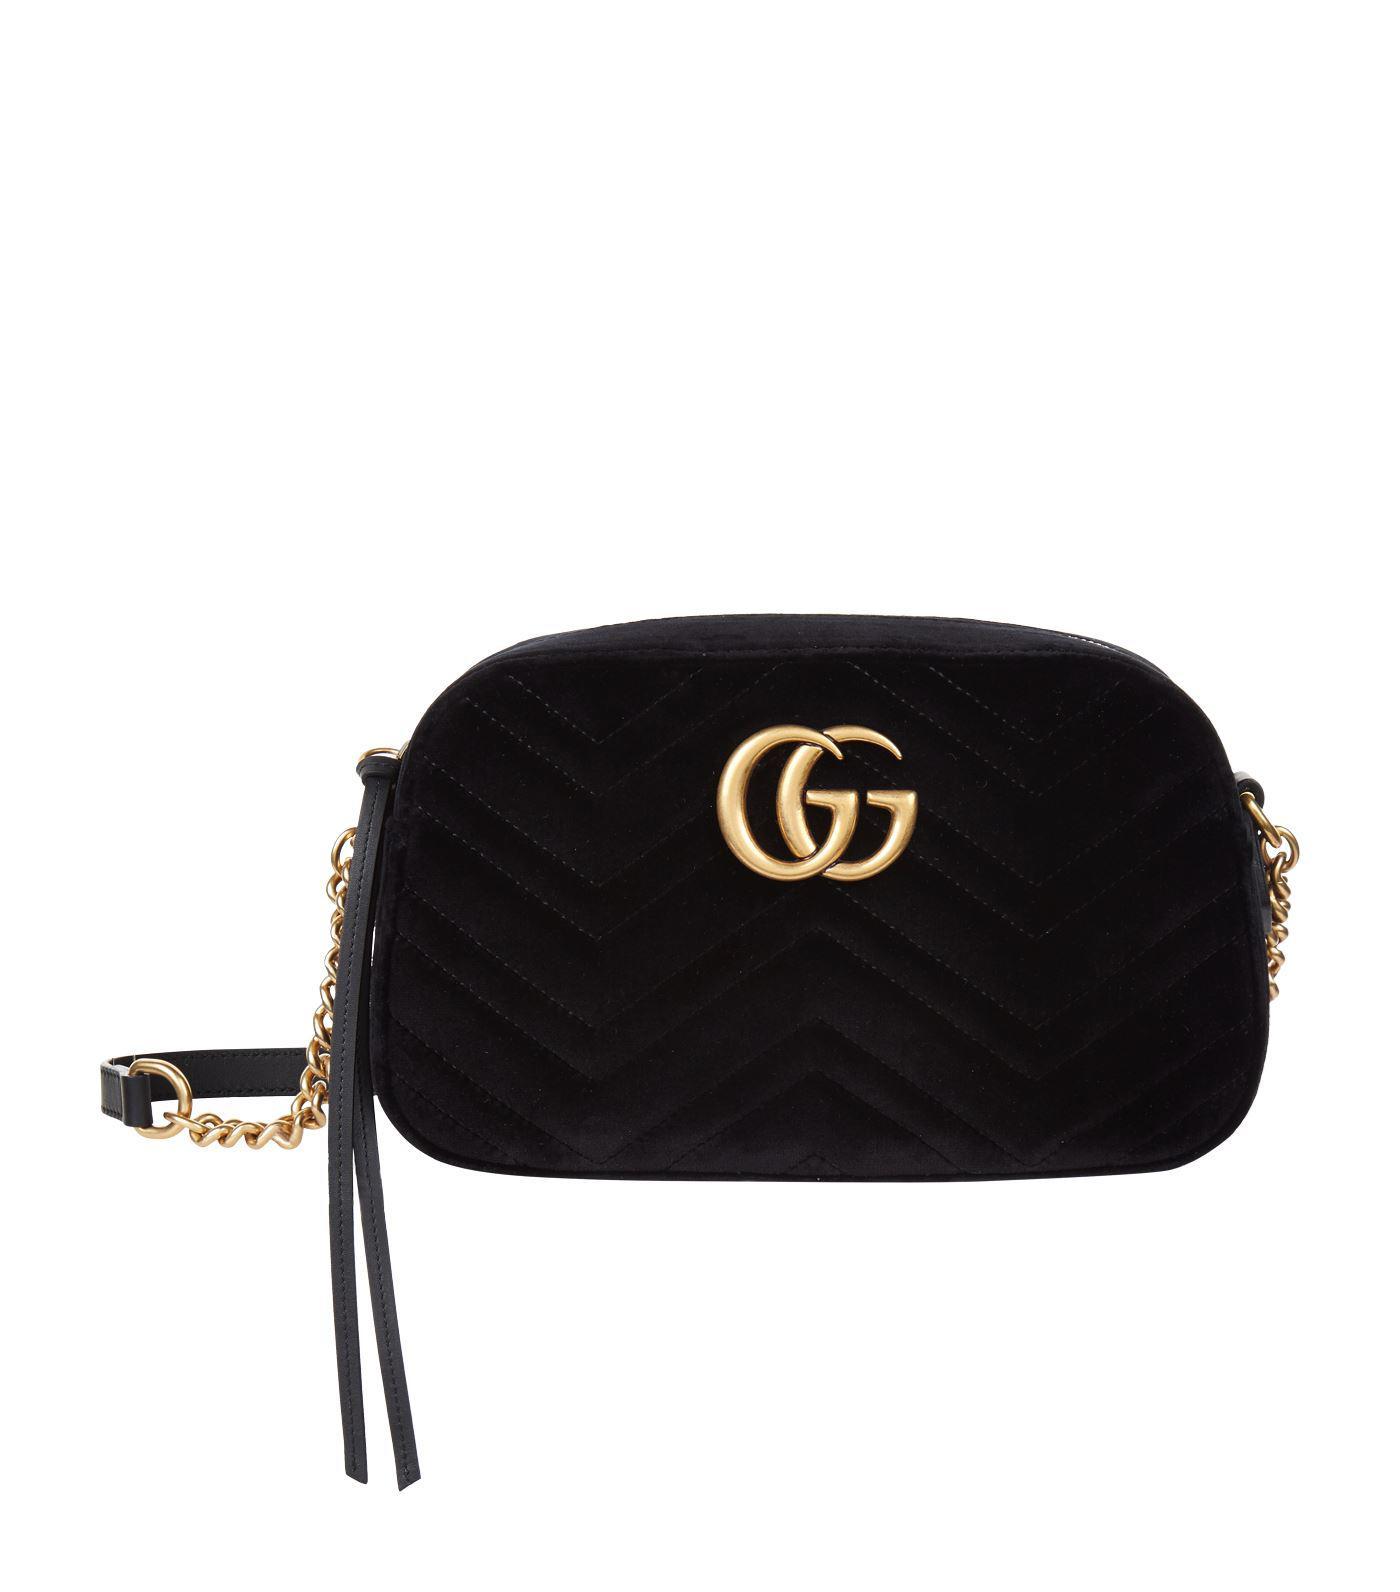 bb557264aa67 Gucci Small Velvet Marmont Matelass Cross Body Bag in Black - Lyst